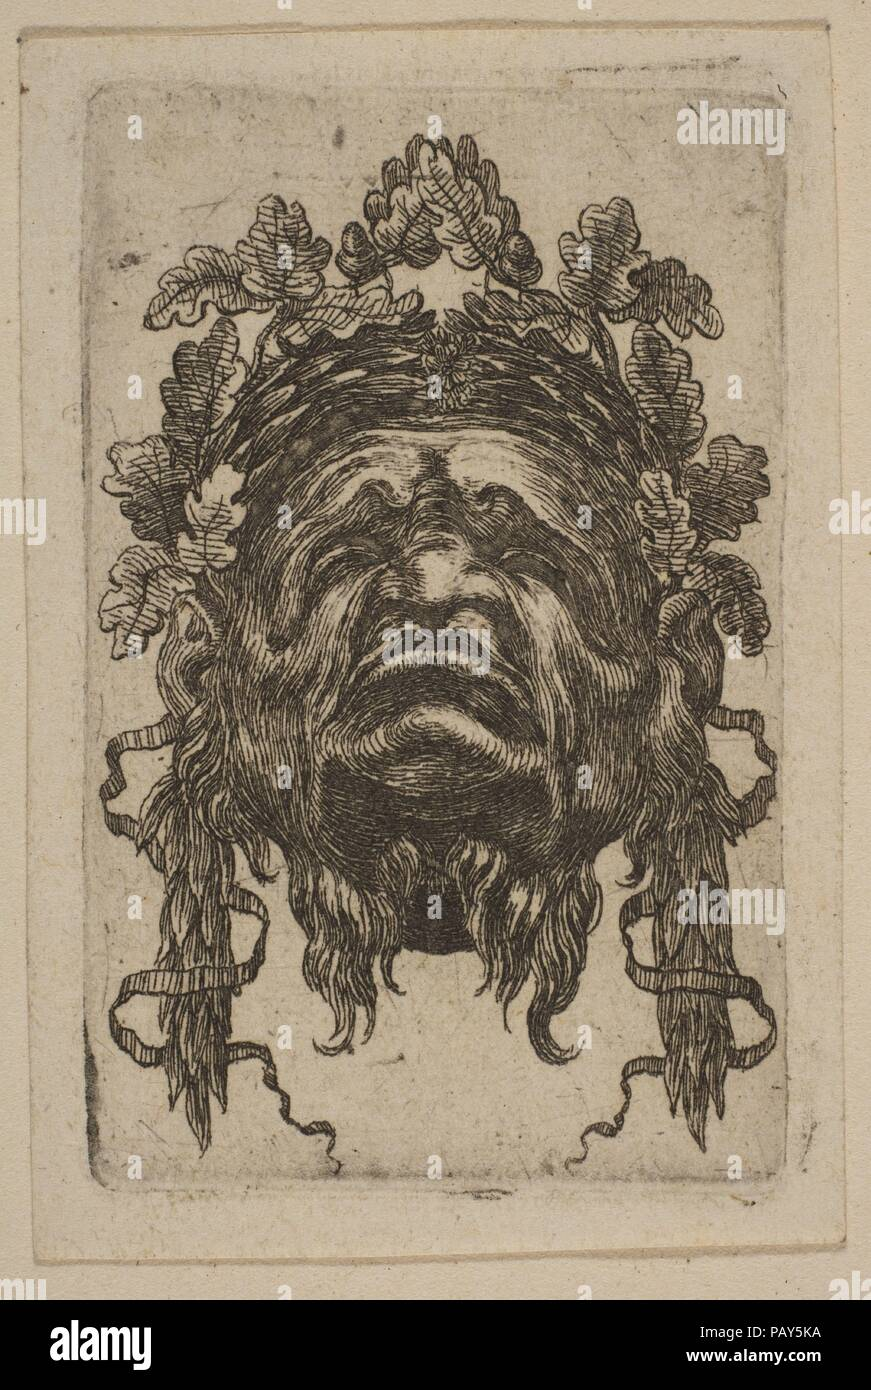 Mask. Artist: Attributed to Stefano della Bella (Italian, Florence 1610-1664 Florence). Museum: Metropolitan Museum of Art, New York, USA. Stock Photo